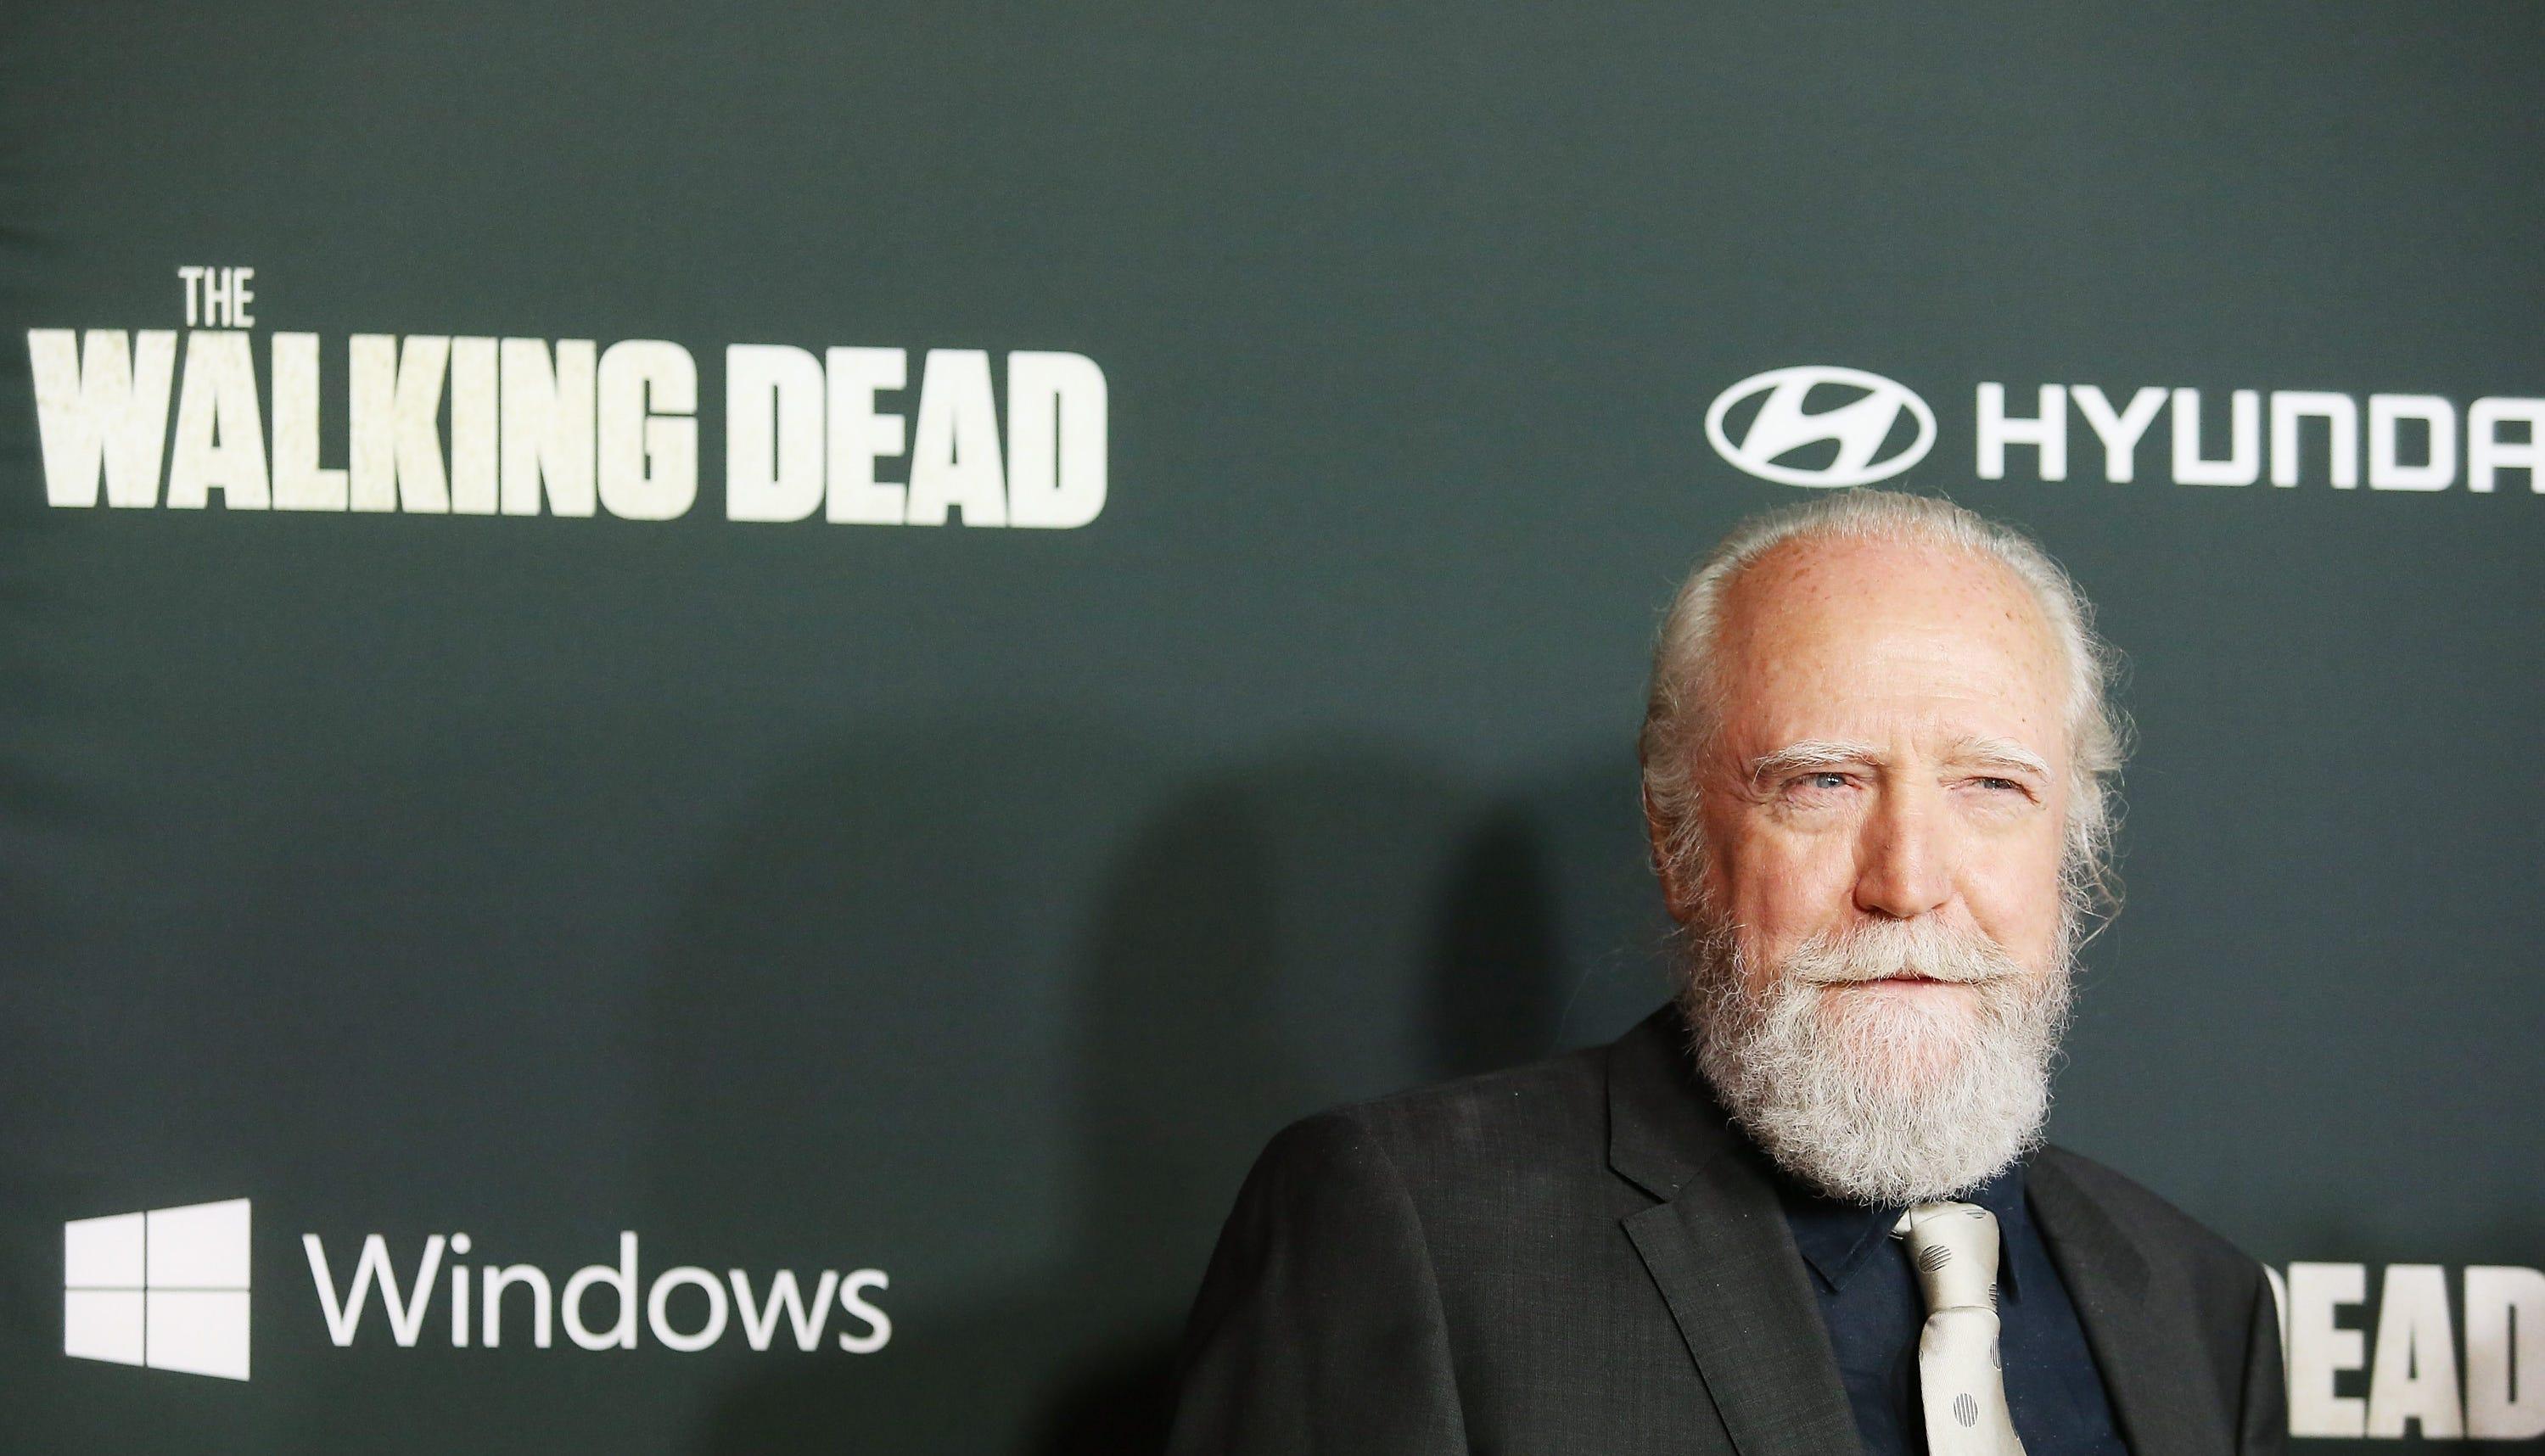 Scott Wilson Hershel On The Walking Dead Dies At 76